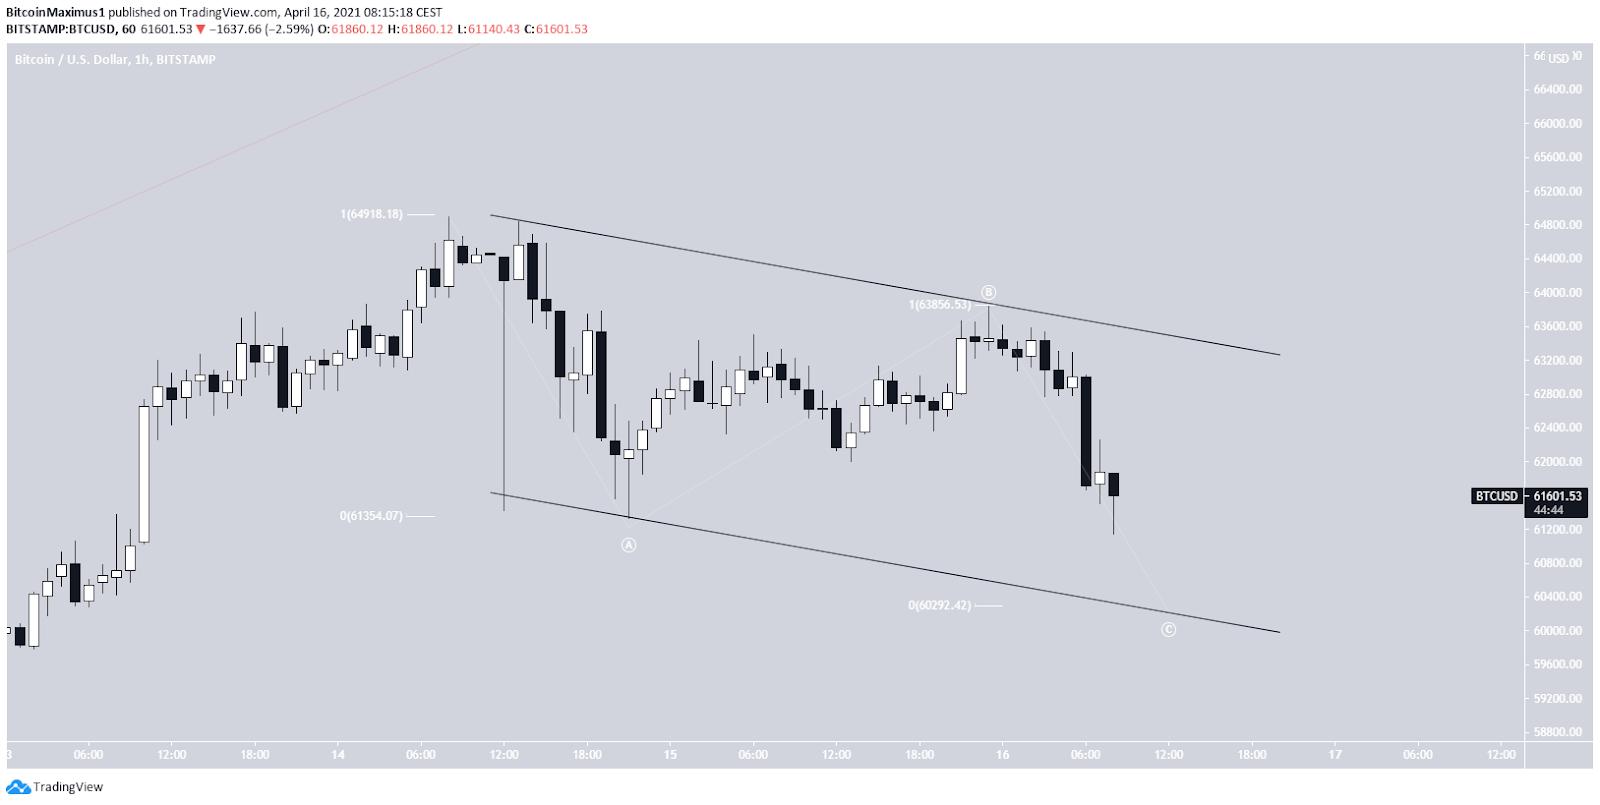 Bitcoin Kurs 1-Stunden-Chart By TradingView